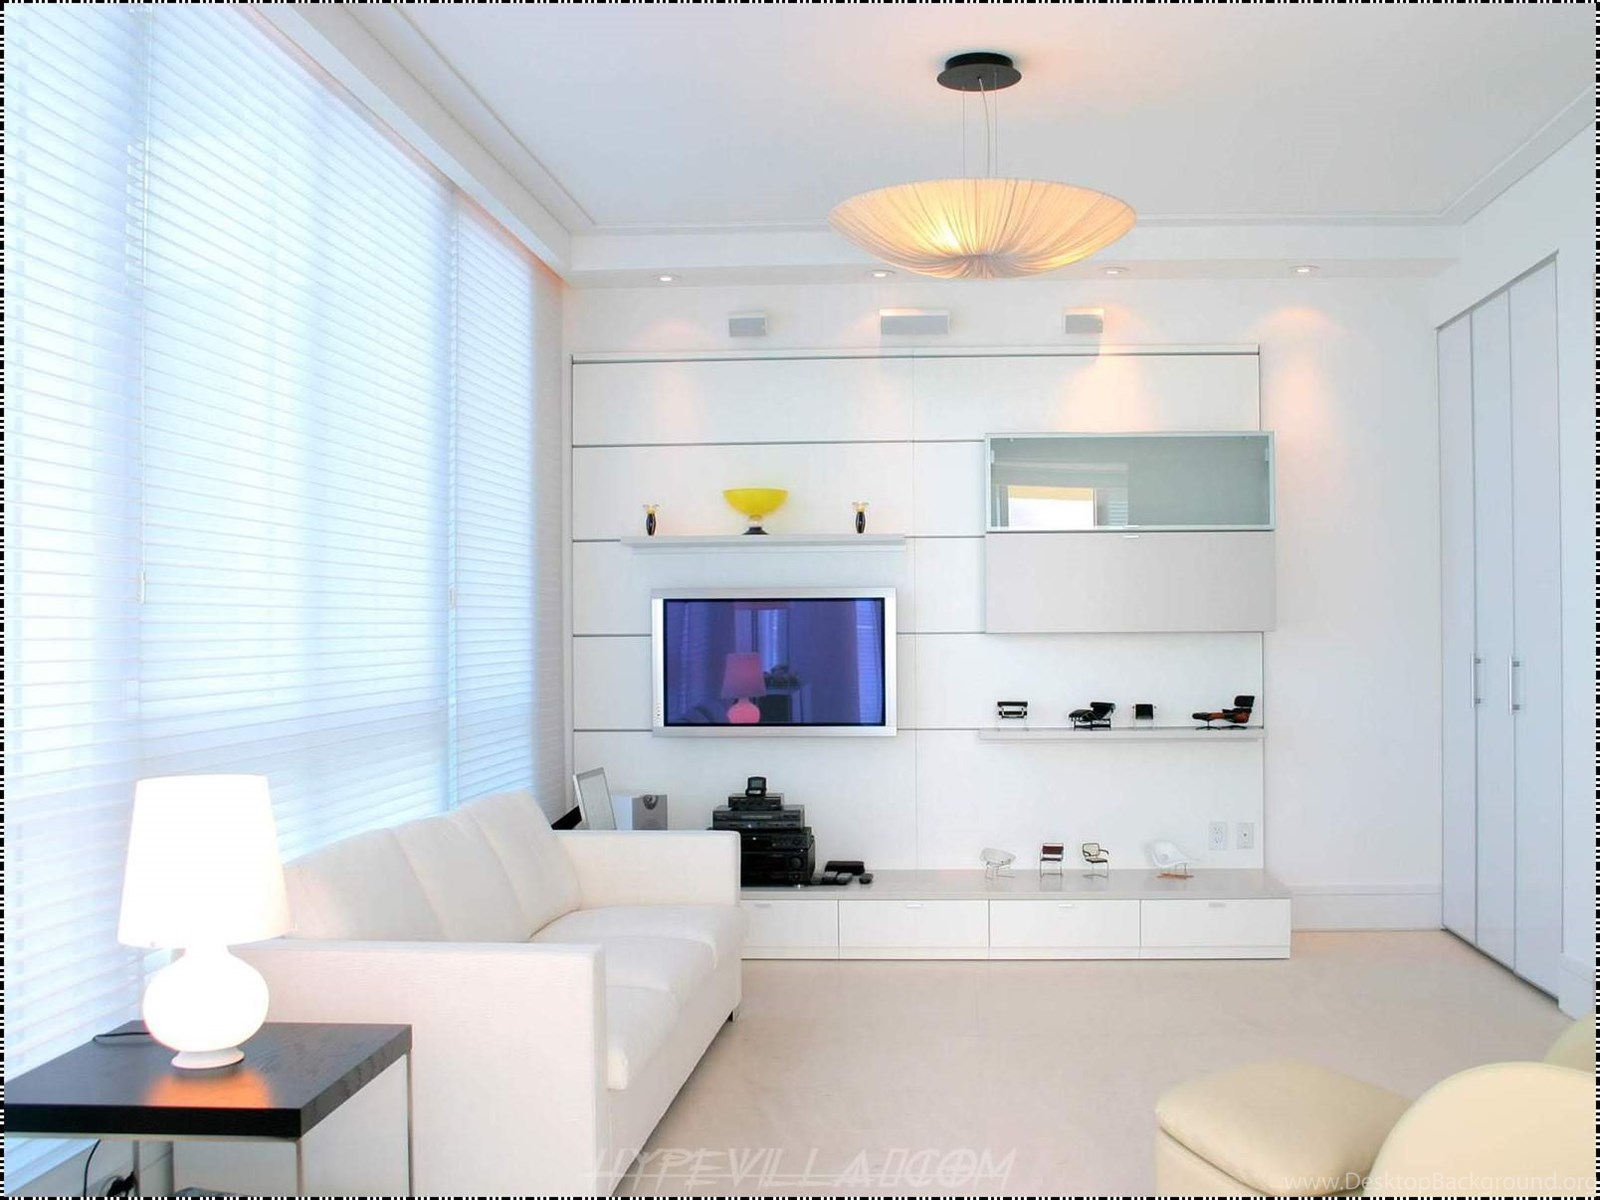 Unique Home Design Wallpapers HD Desktop Background